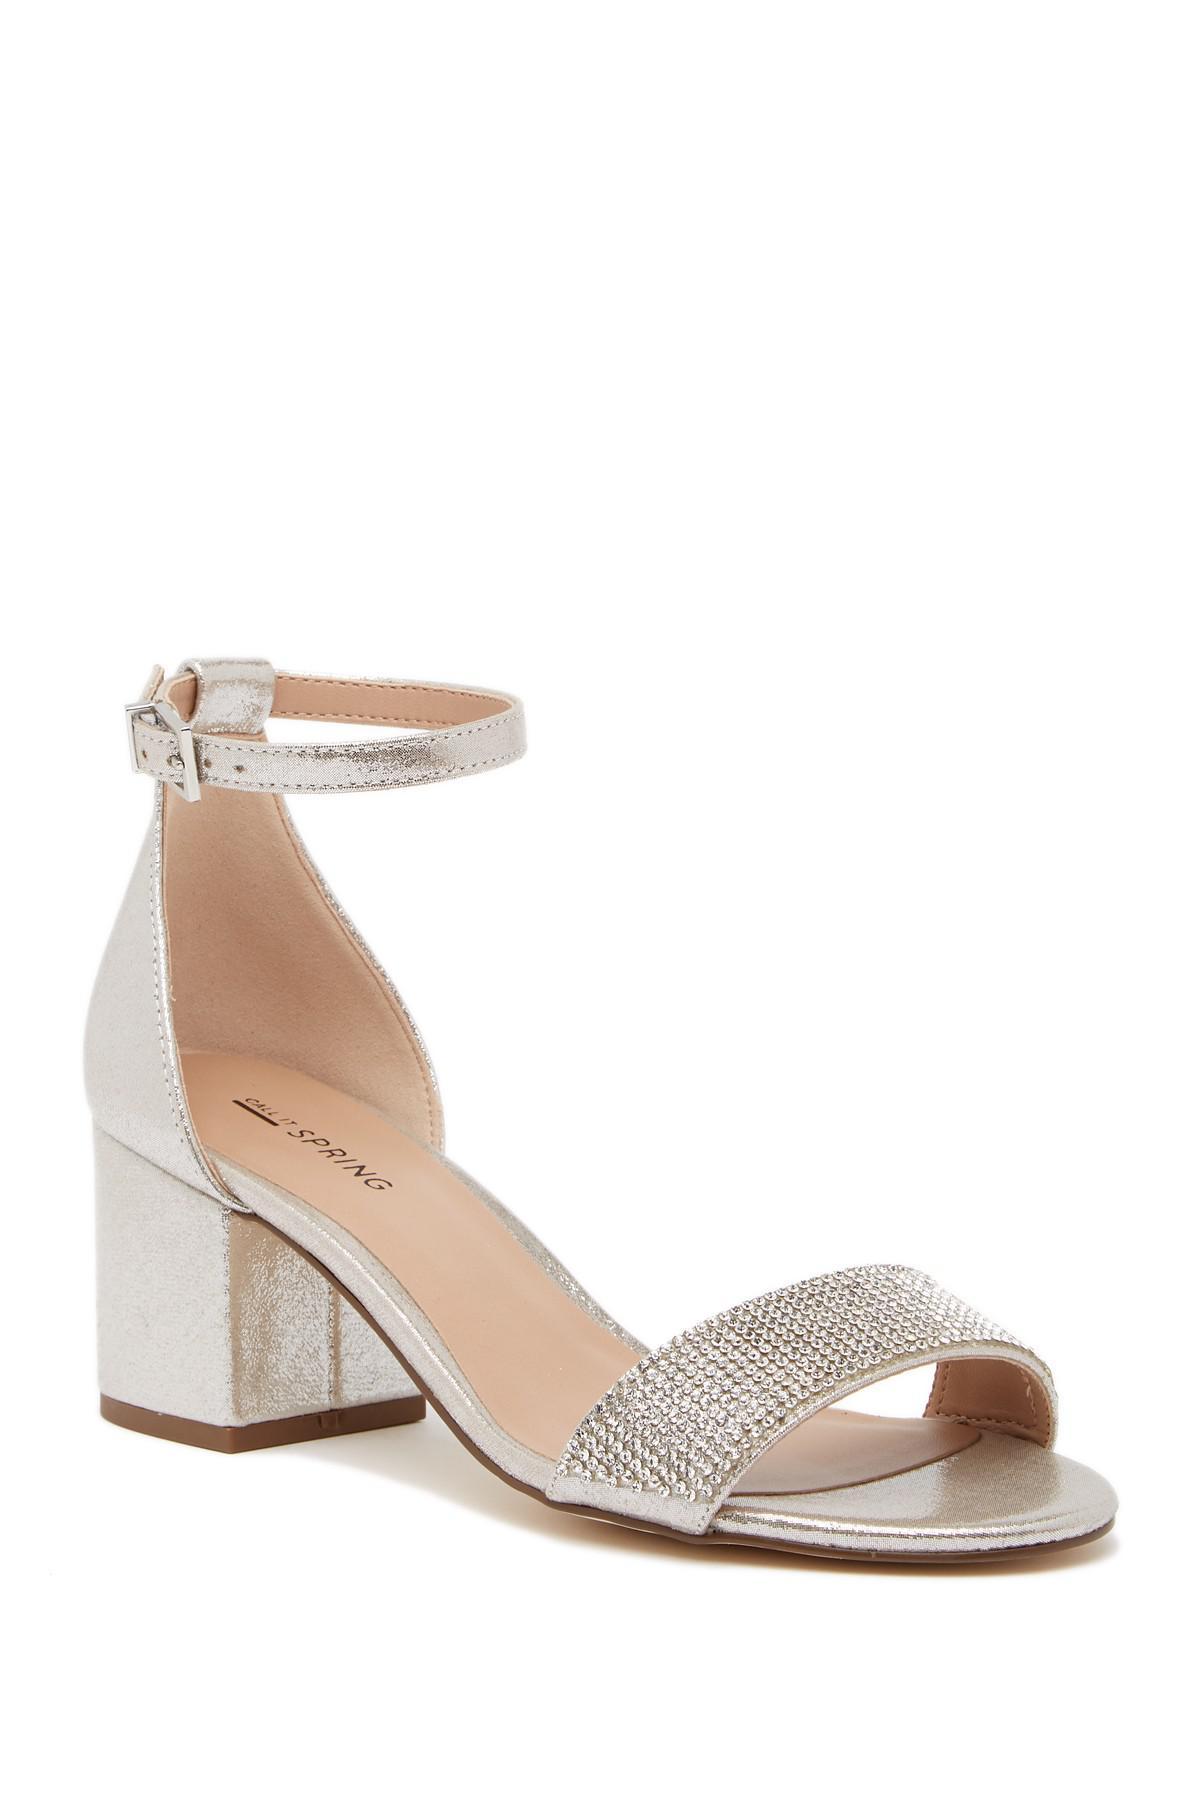 cc8b0a62b53 Lyst - Call It Spring Theladien Block Heel Sandal in Metallic